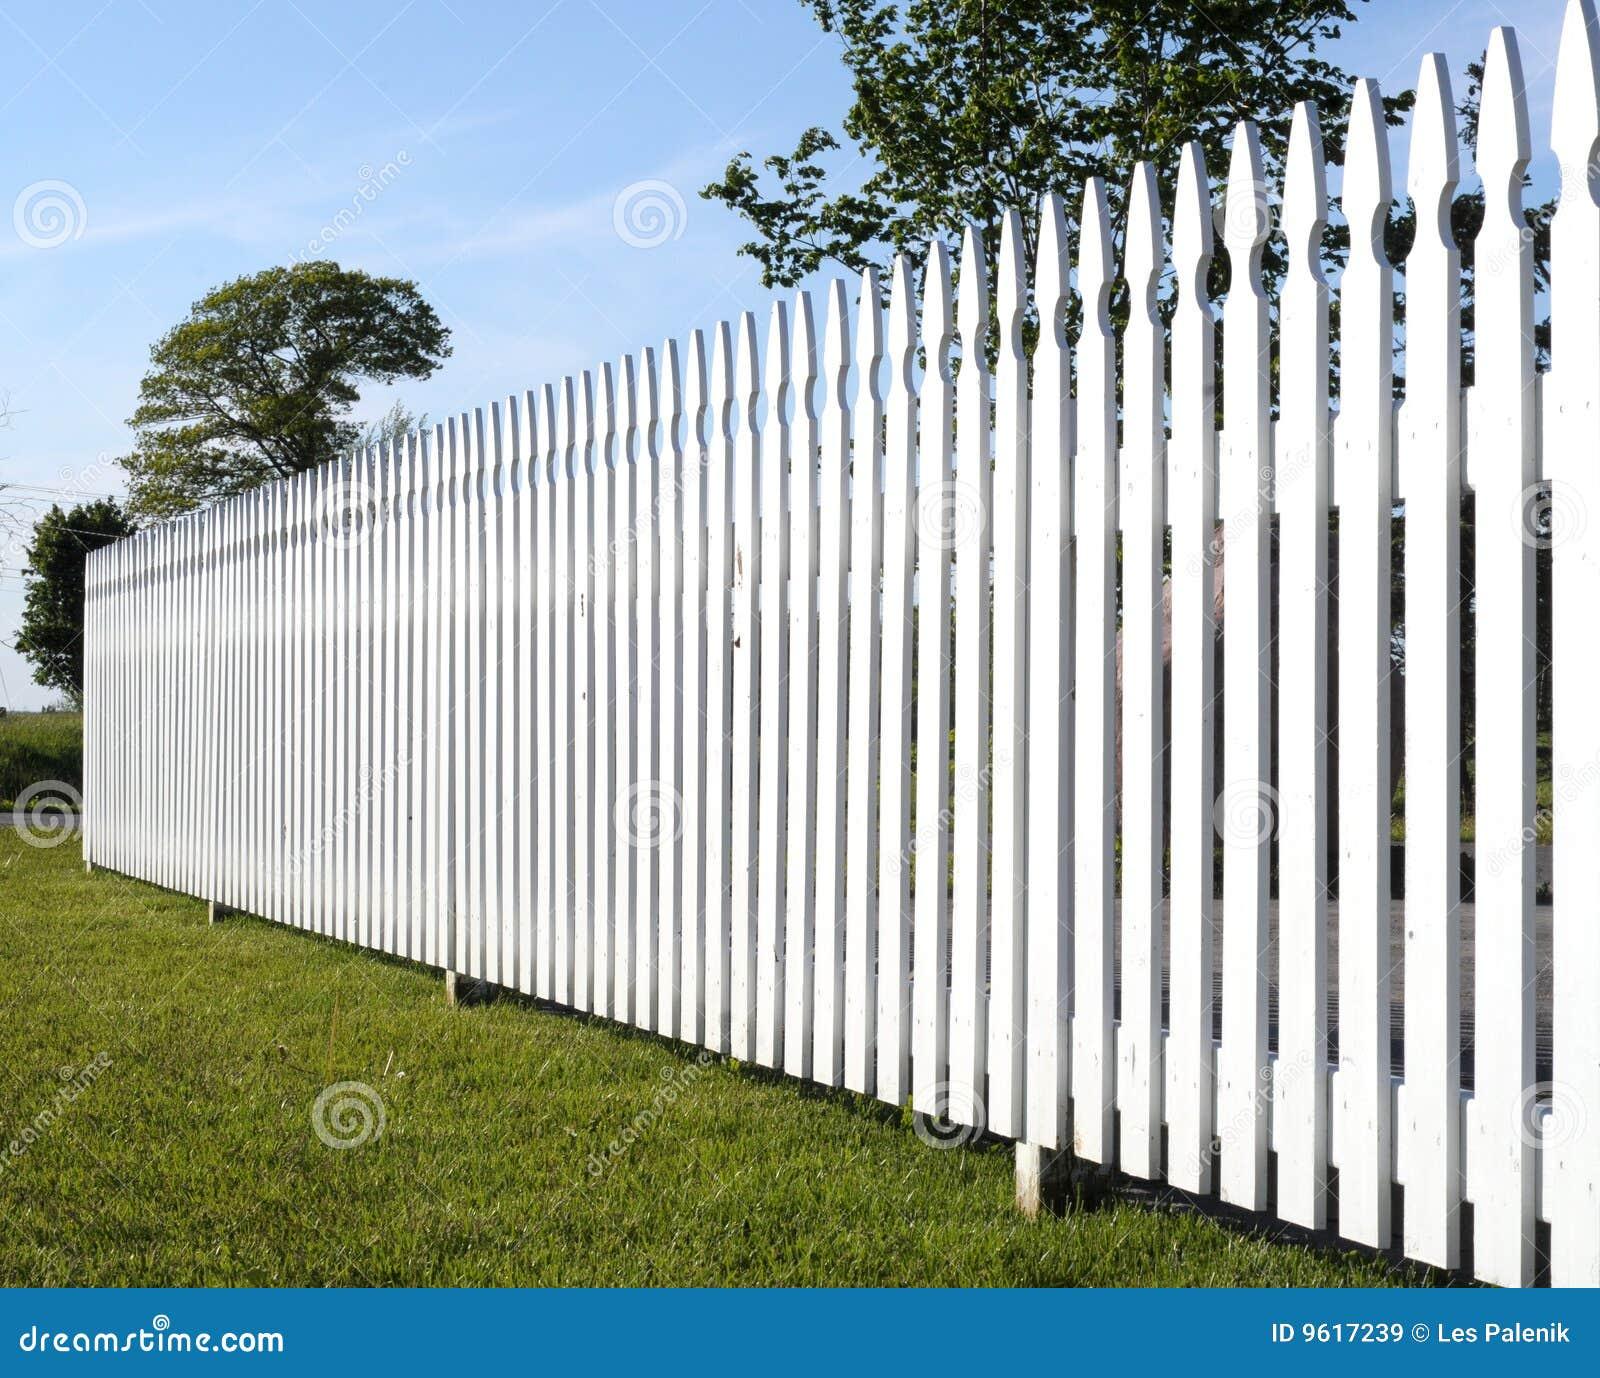 white picket fence royalty free stock images image 9617239